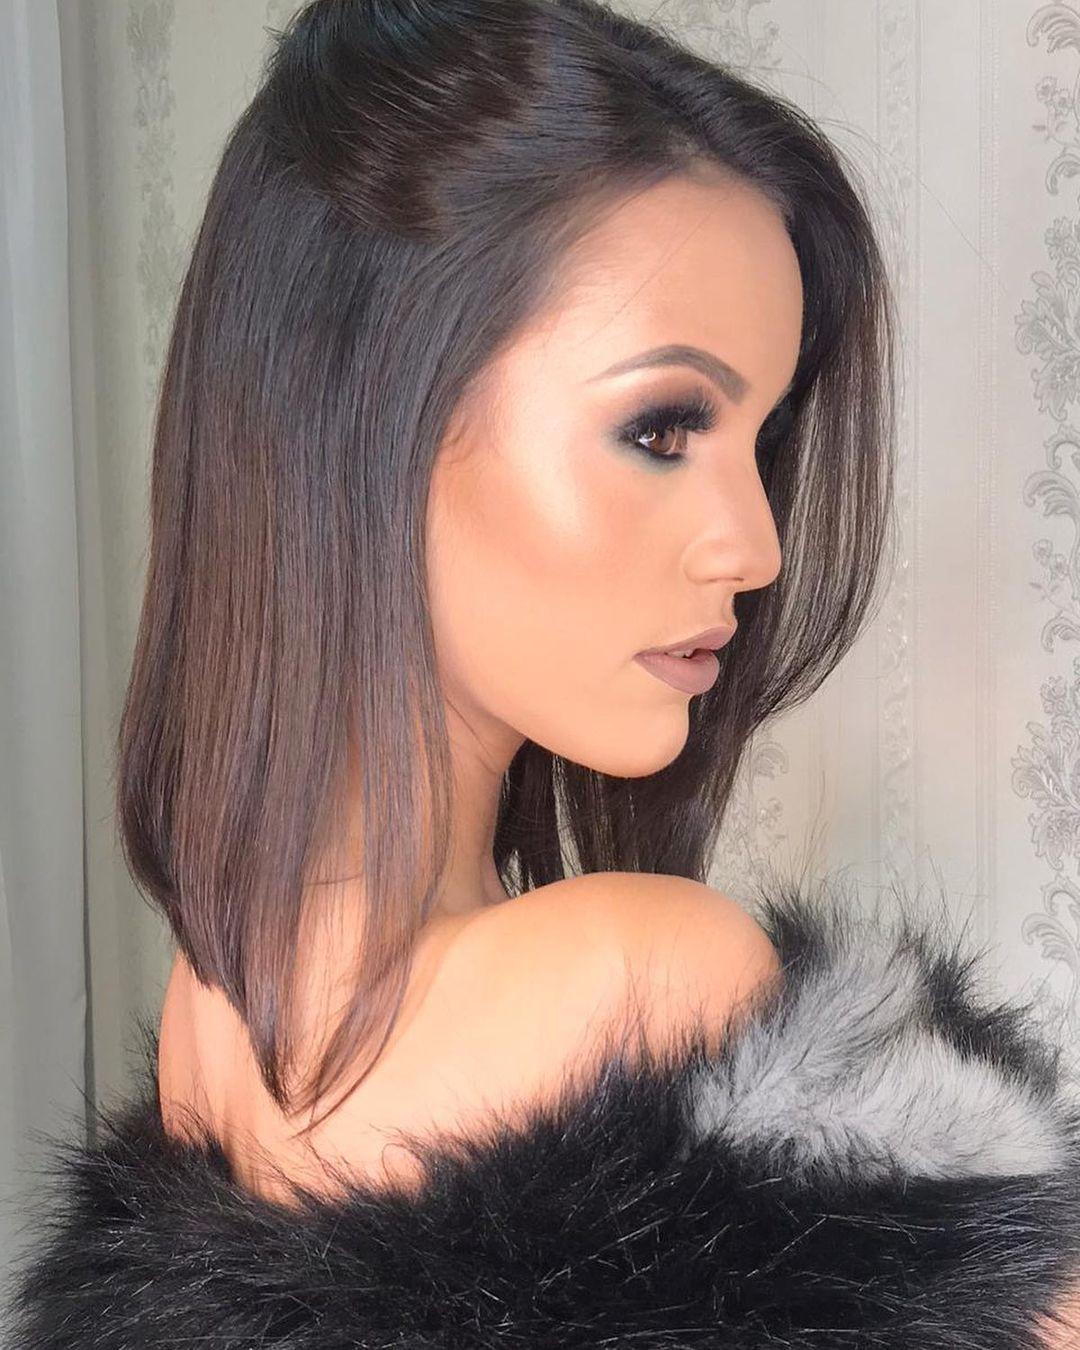 rafaella felipe, top 20 de miss brasil mundo 2019. - Página 4 Qtdoh710